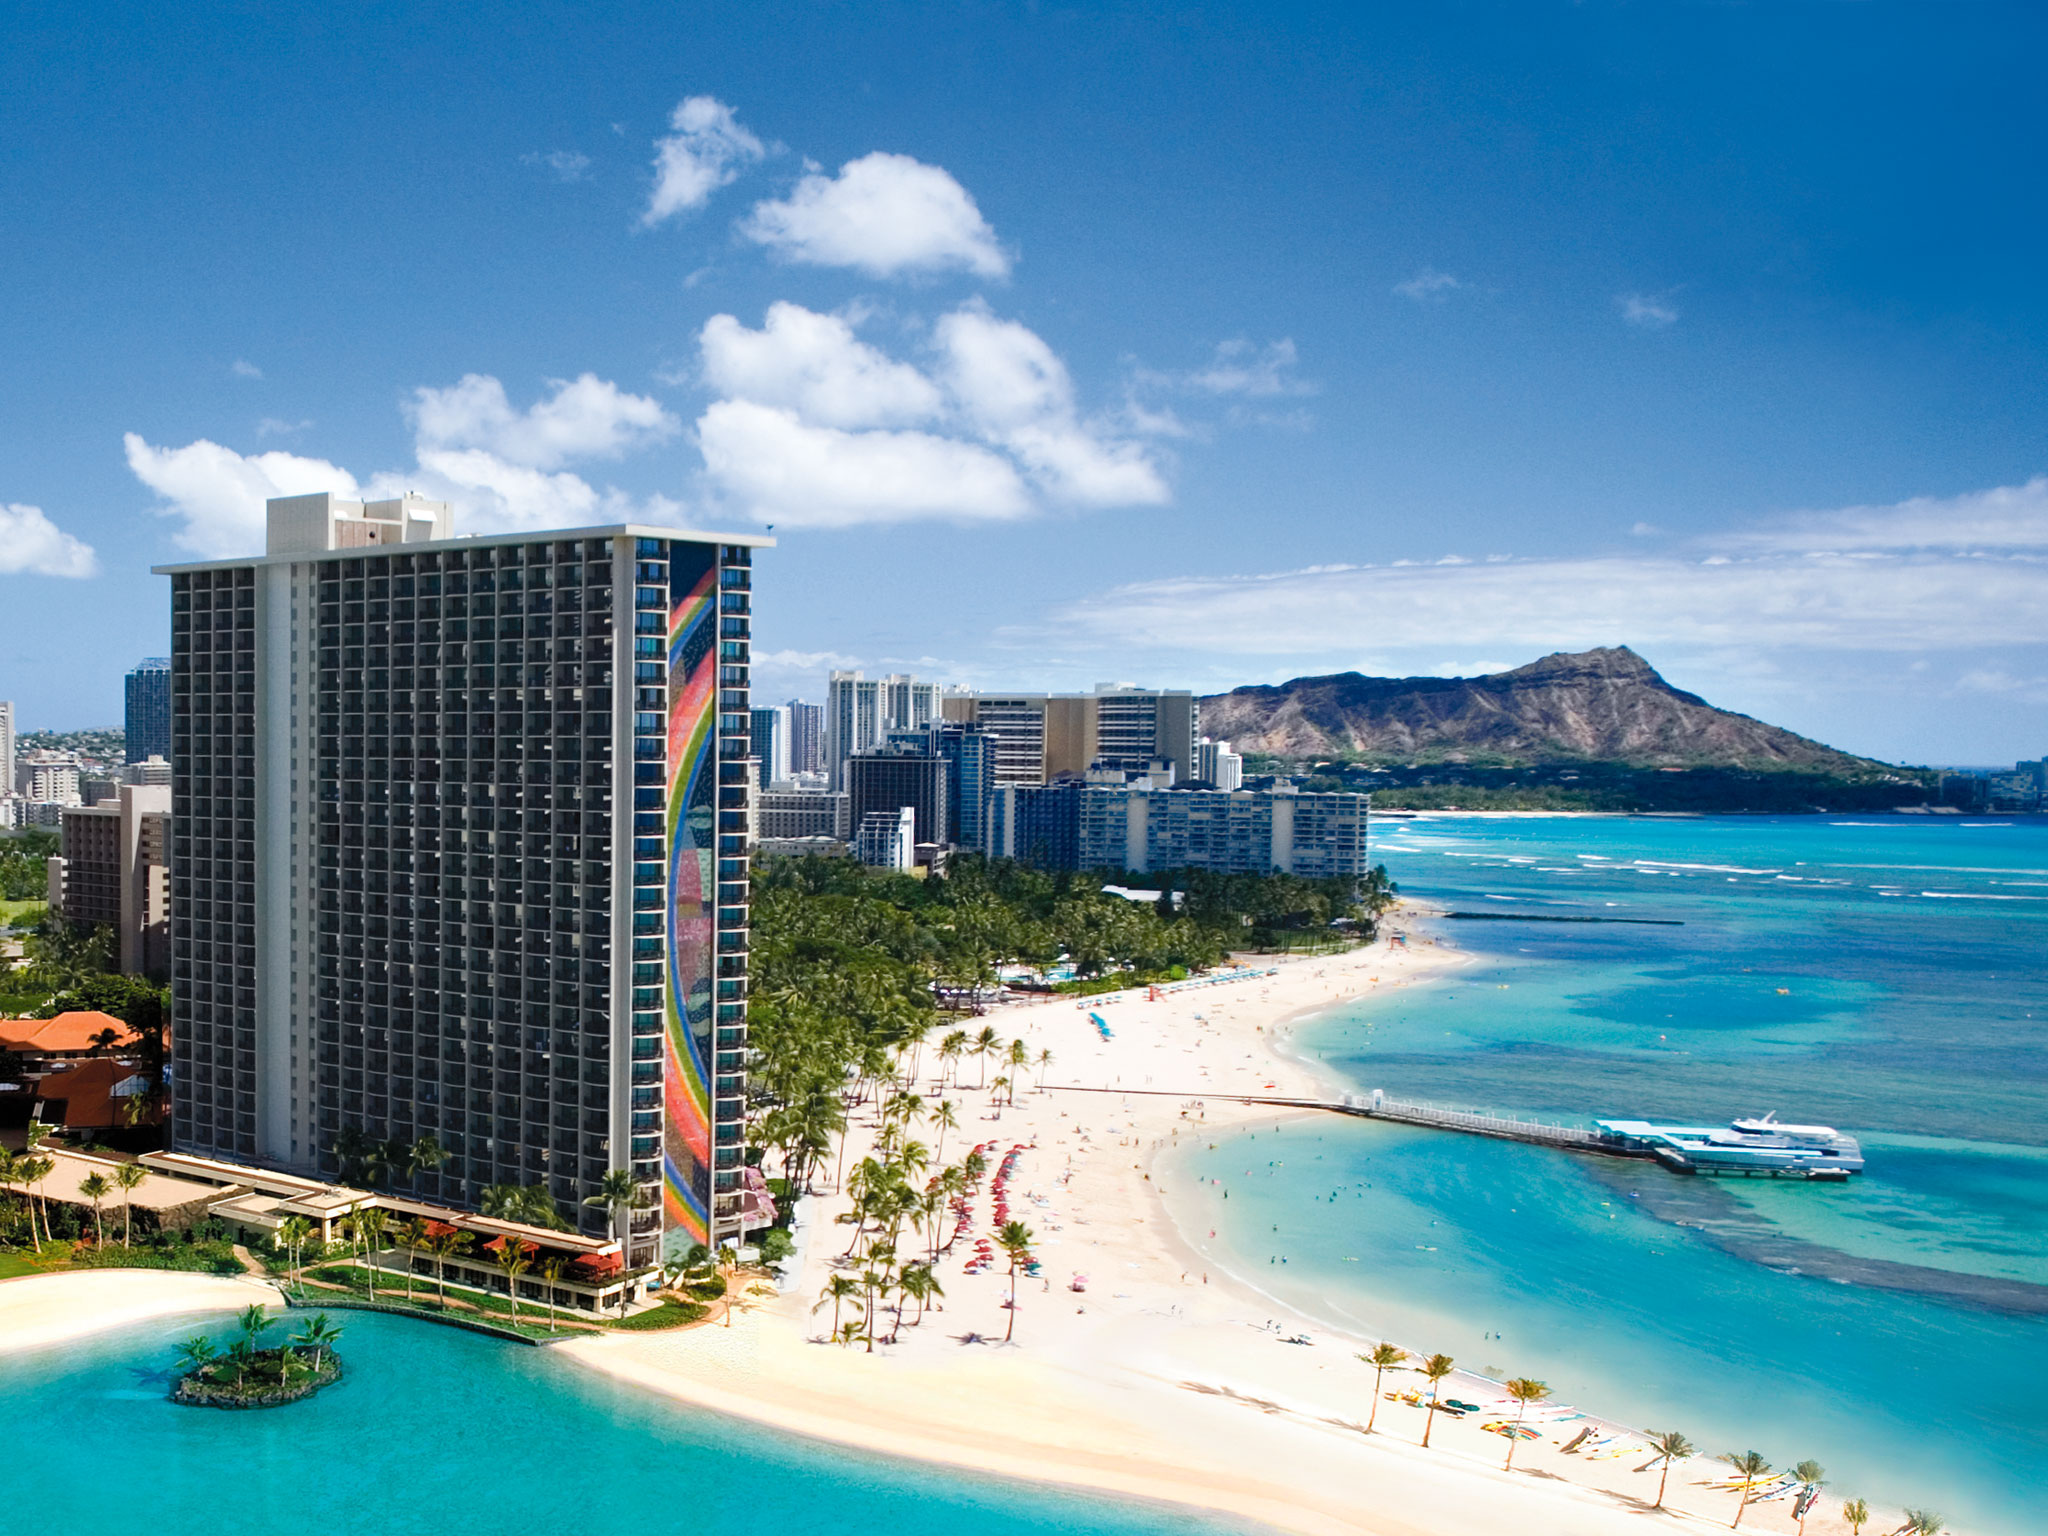 Download Waikiki Beach Hotel Pictures Download Desktop Wallpaper 2048x1536